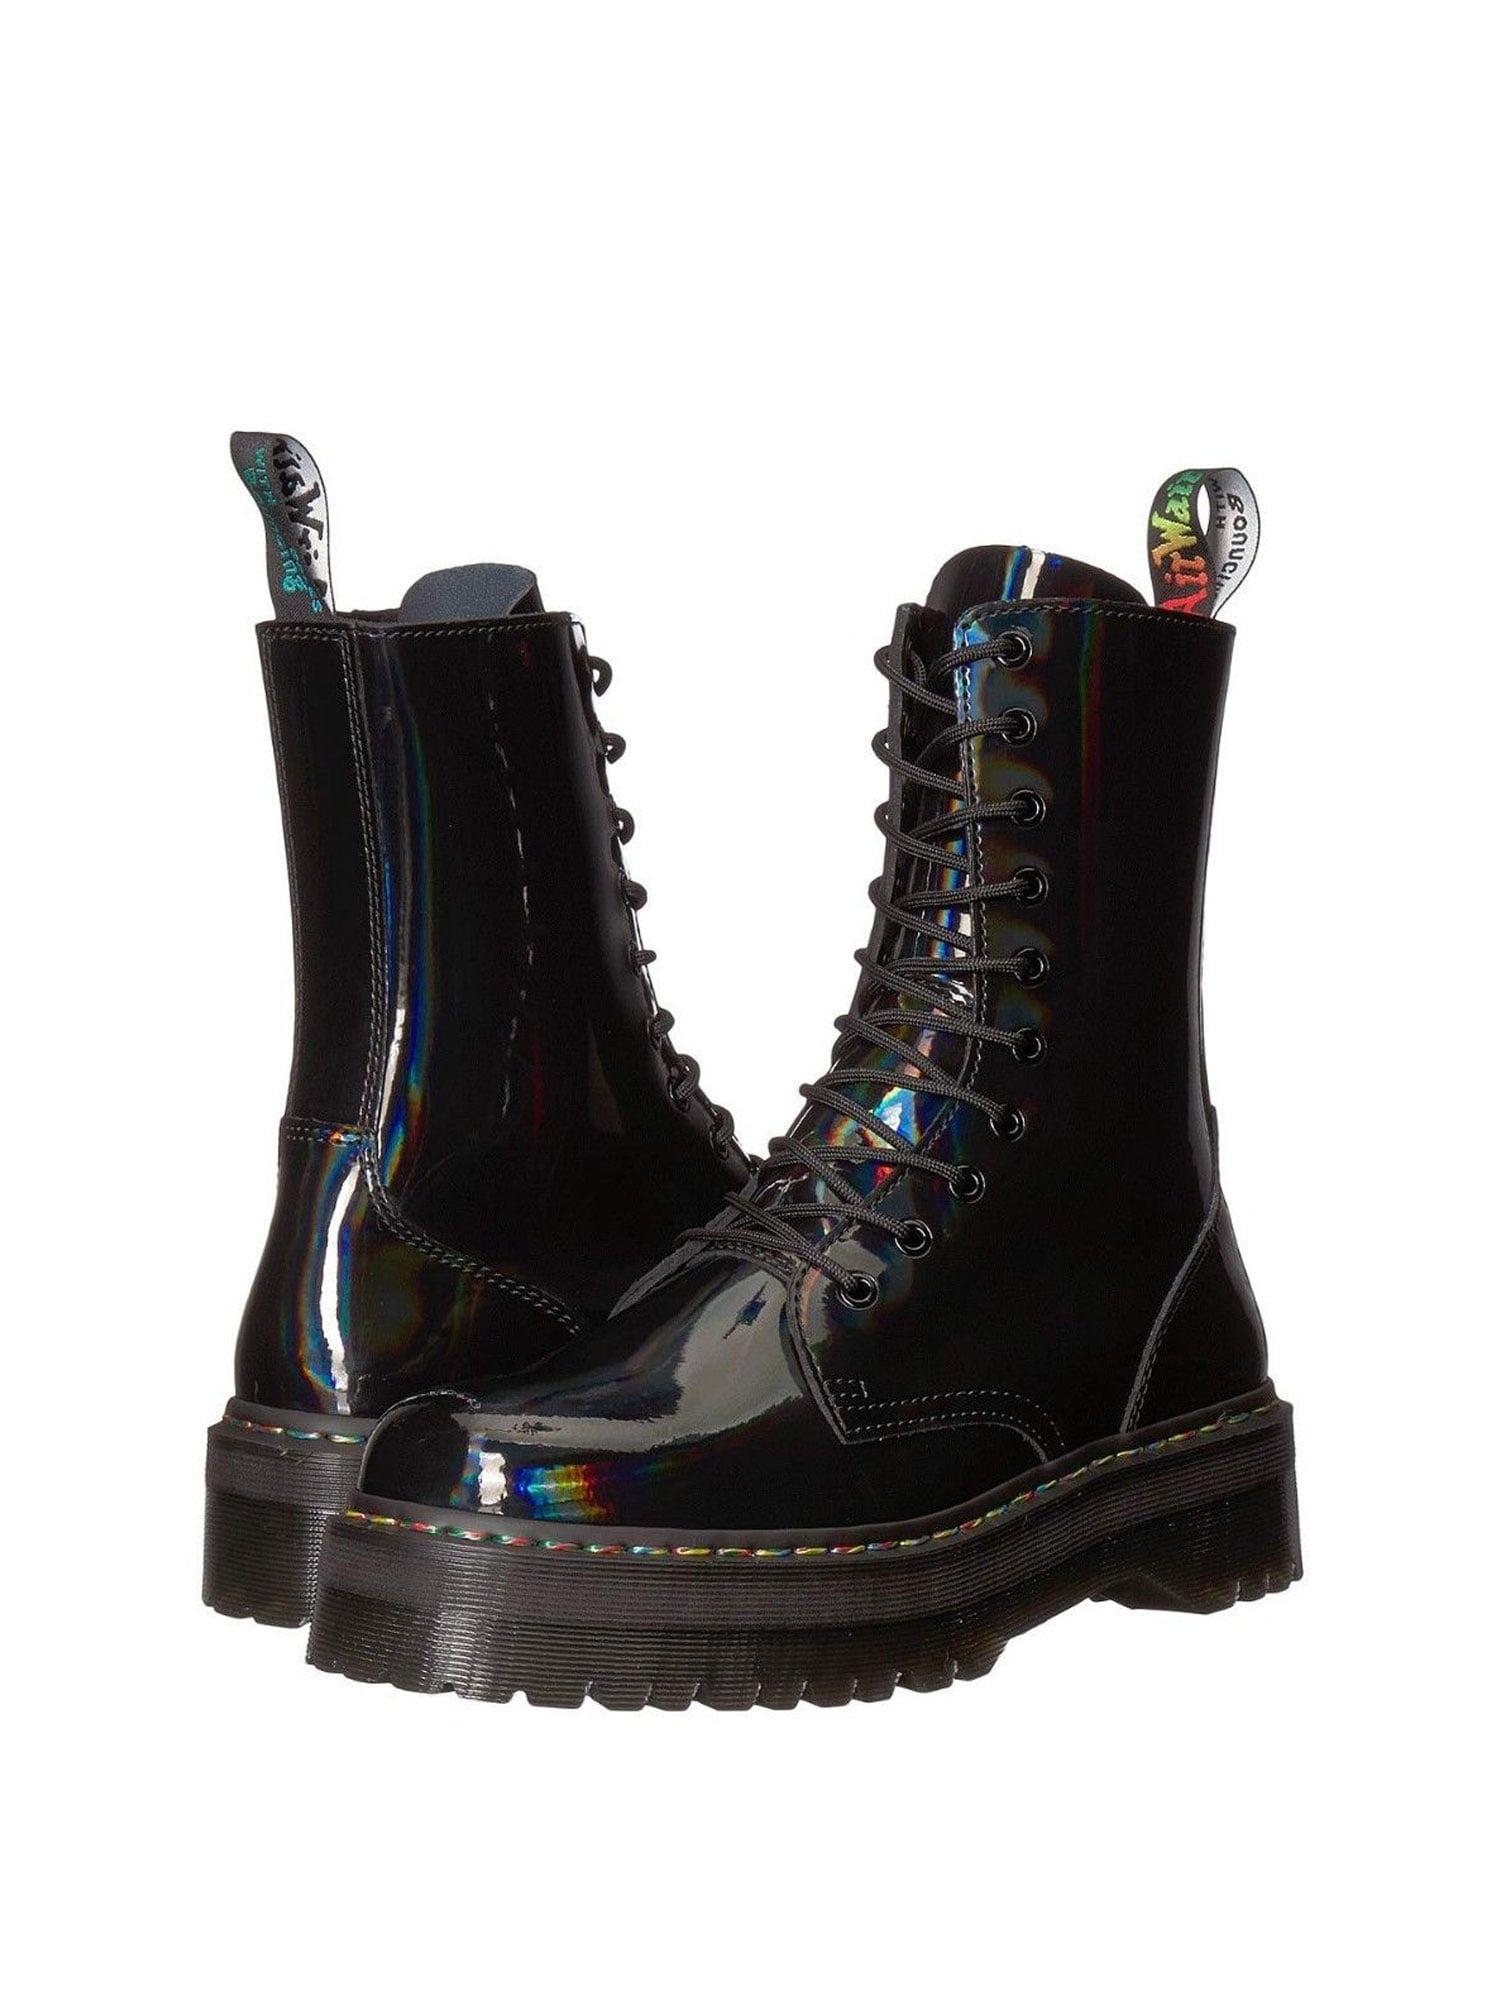 6ab2fc9a2cd Dr. Martens - Dr. Martens Jadon Hi Rainbow Patent Women s Leather Boots  24668001 - Walmart.com